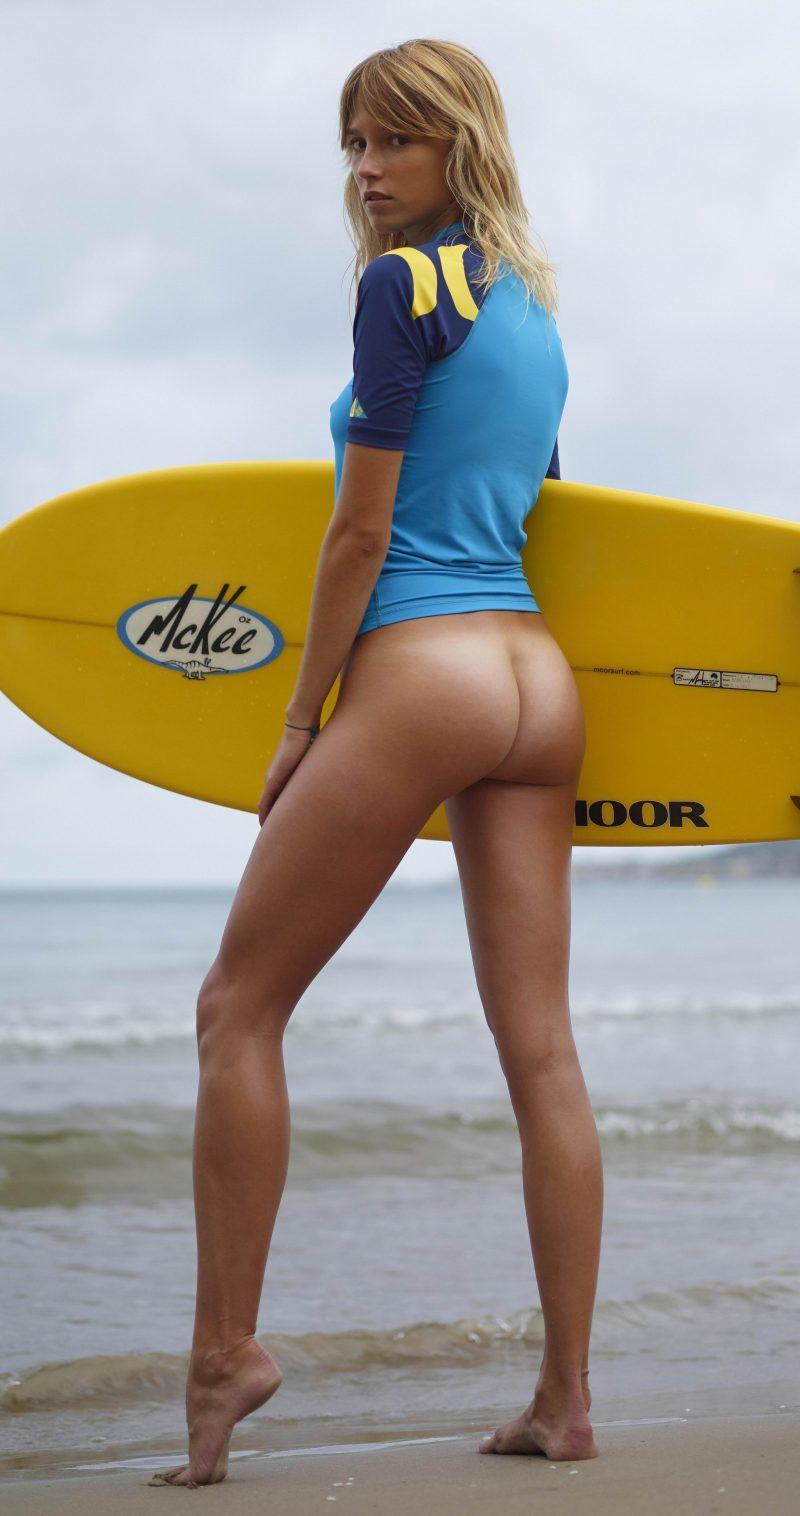 bottomless girls nude mix vol2 37 800x1516